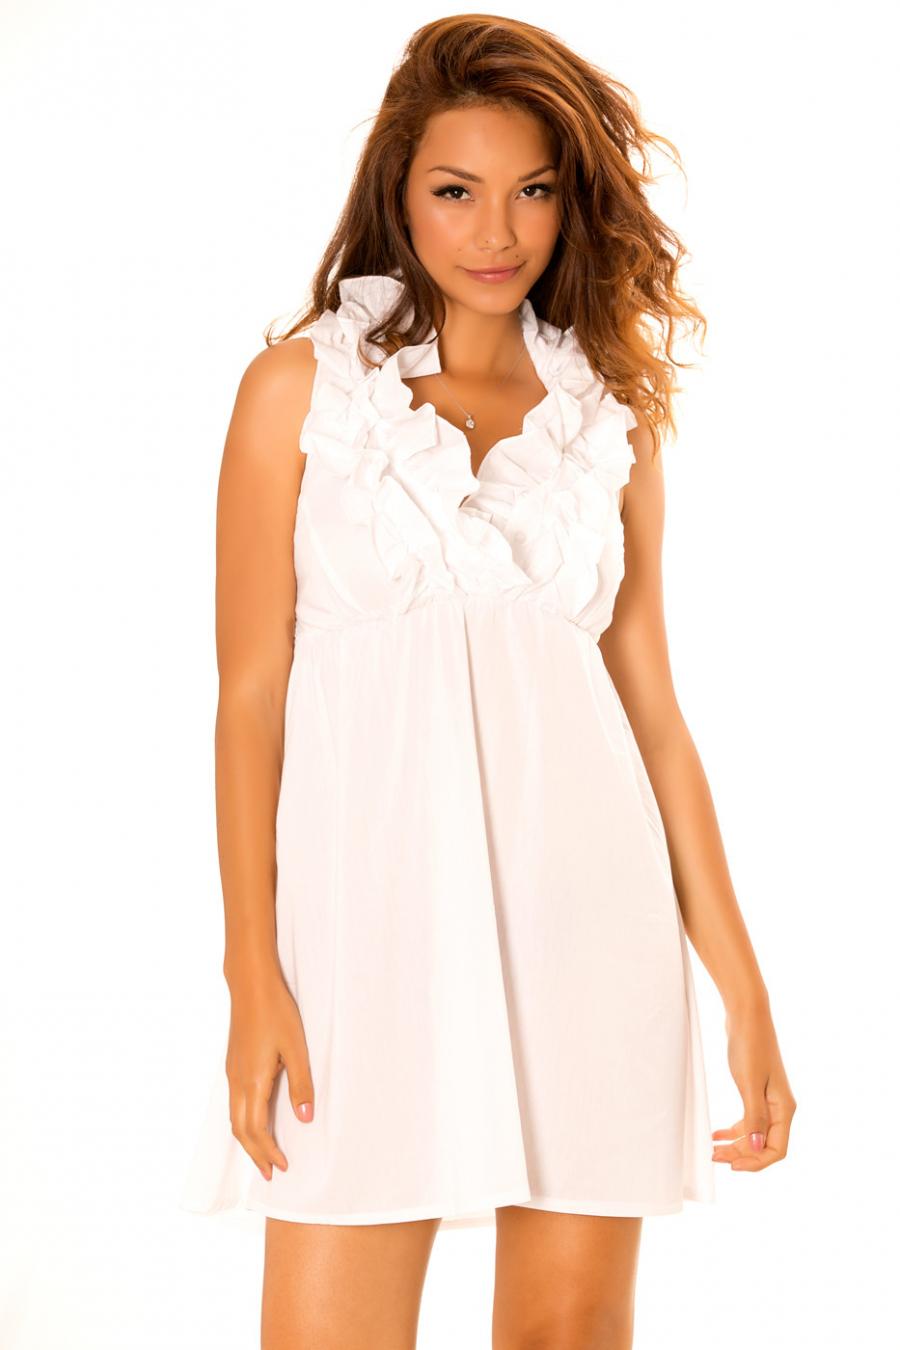 Robe blanche à col froufrou et dos nu. Robe Tendance. 930